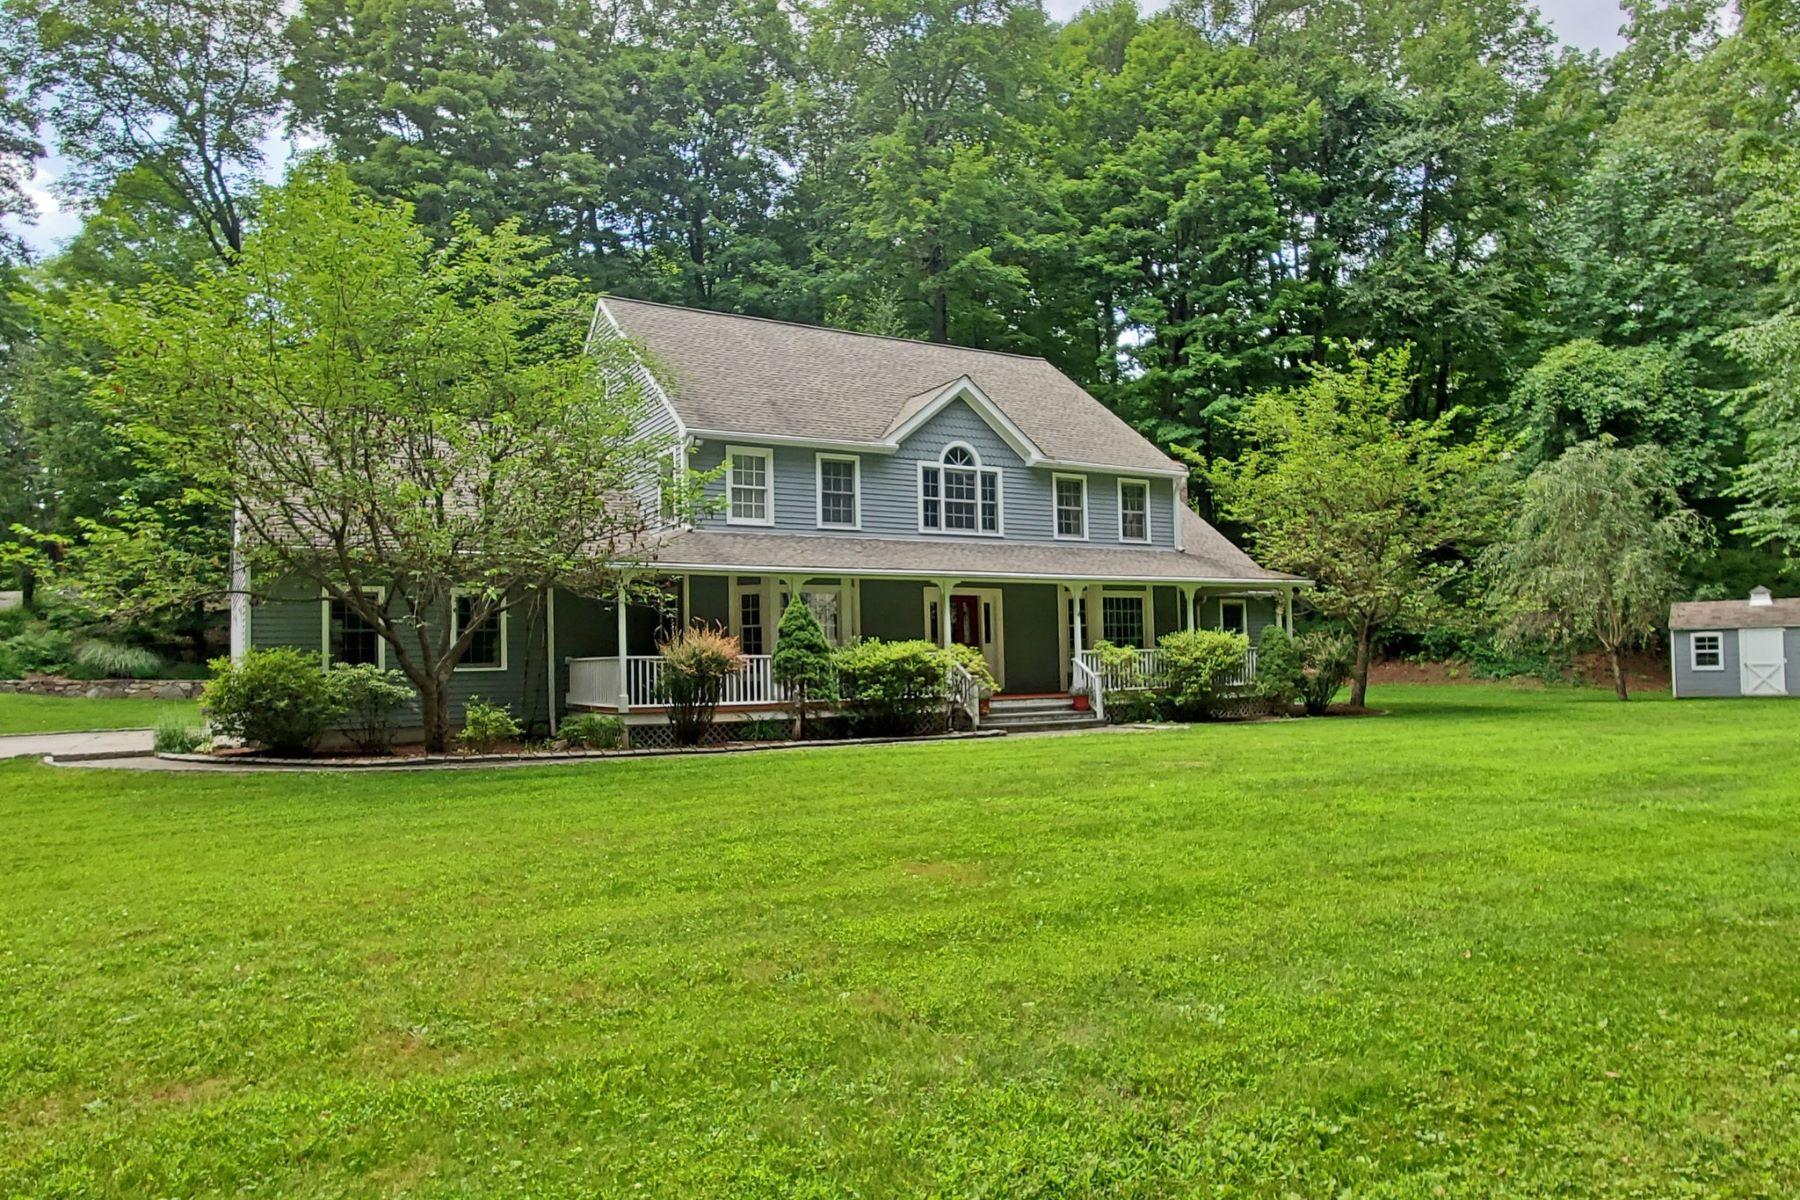 Single Family Homes για την Πώληση στο Welcoming Colonial Farmhouse 26 Linden Road, Ridgefield, Κονεκτικατ 06877 Ηνωμένες Πολιτείες